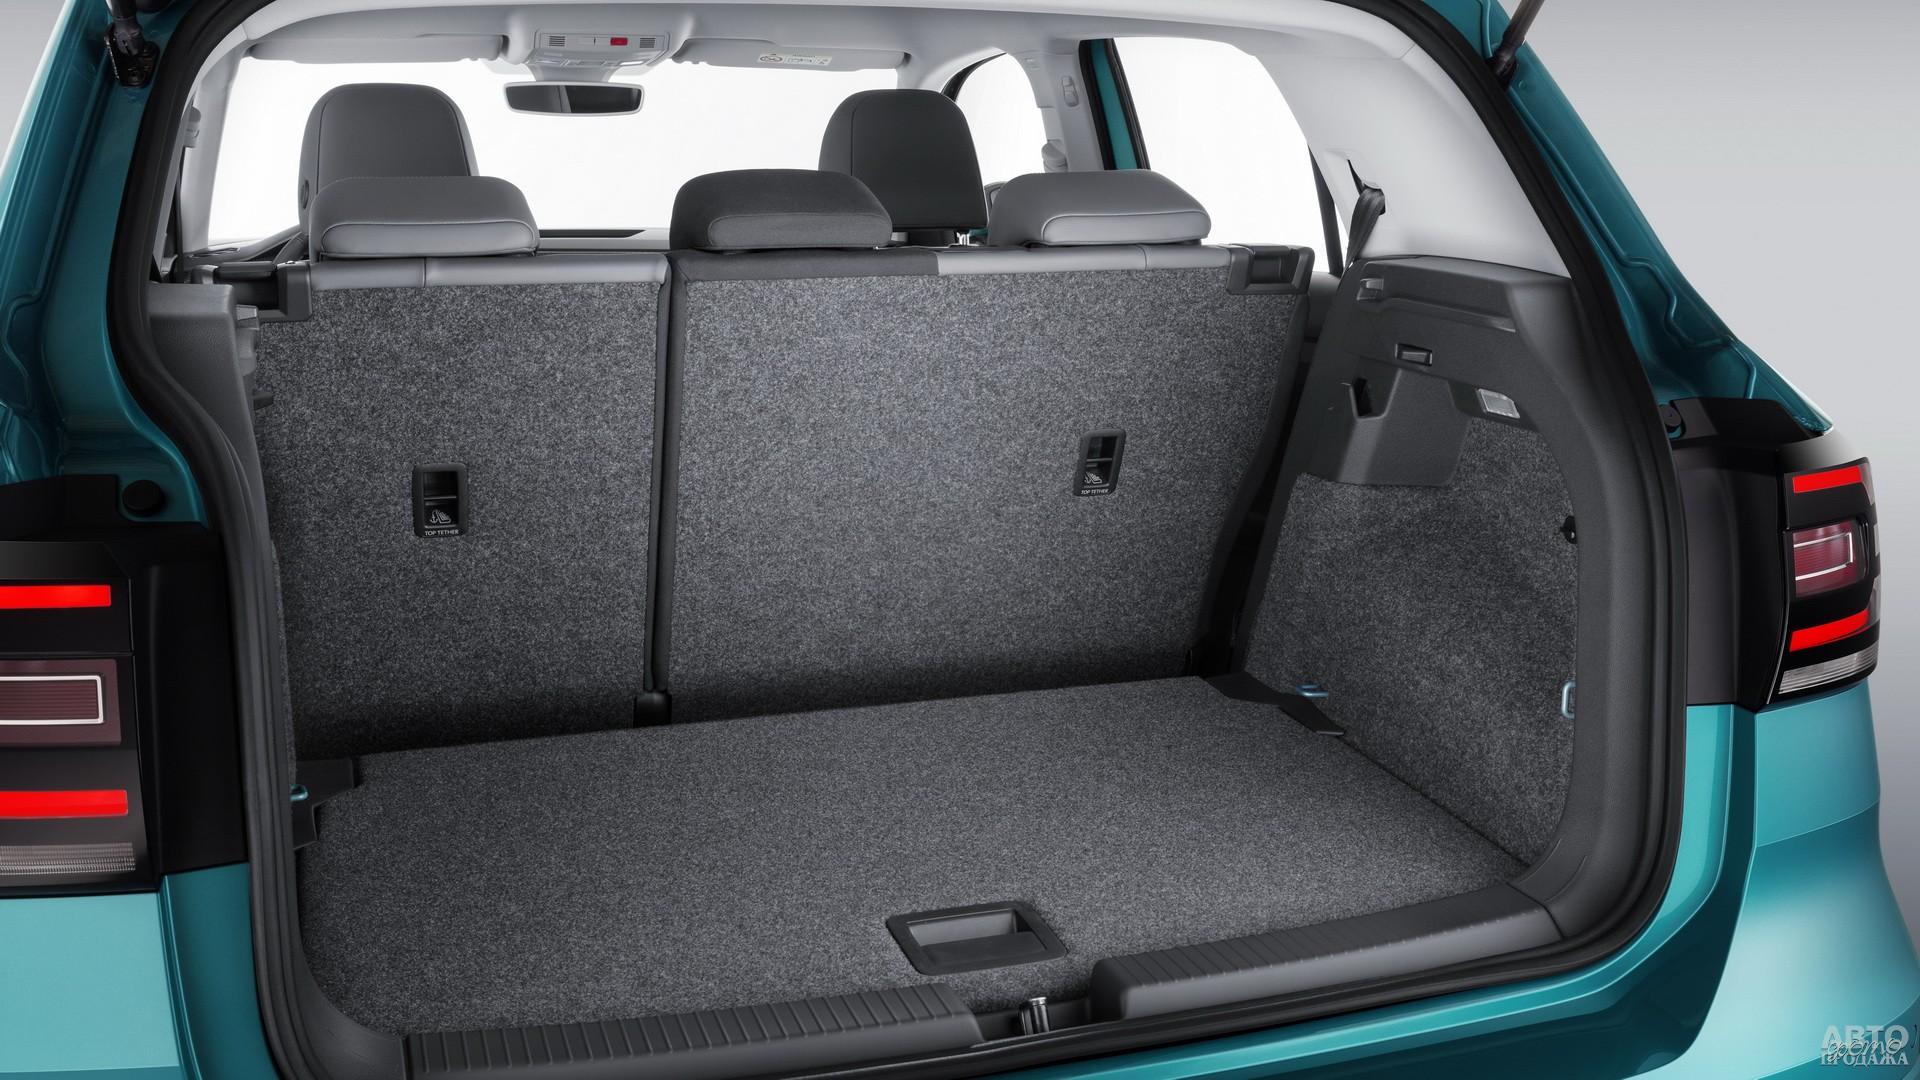 В зависимости от положения сидений объем багажника Volkswagеn равен 385-455 л